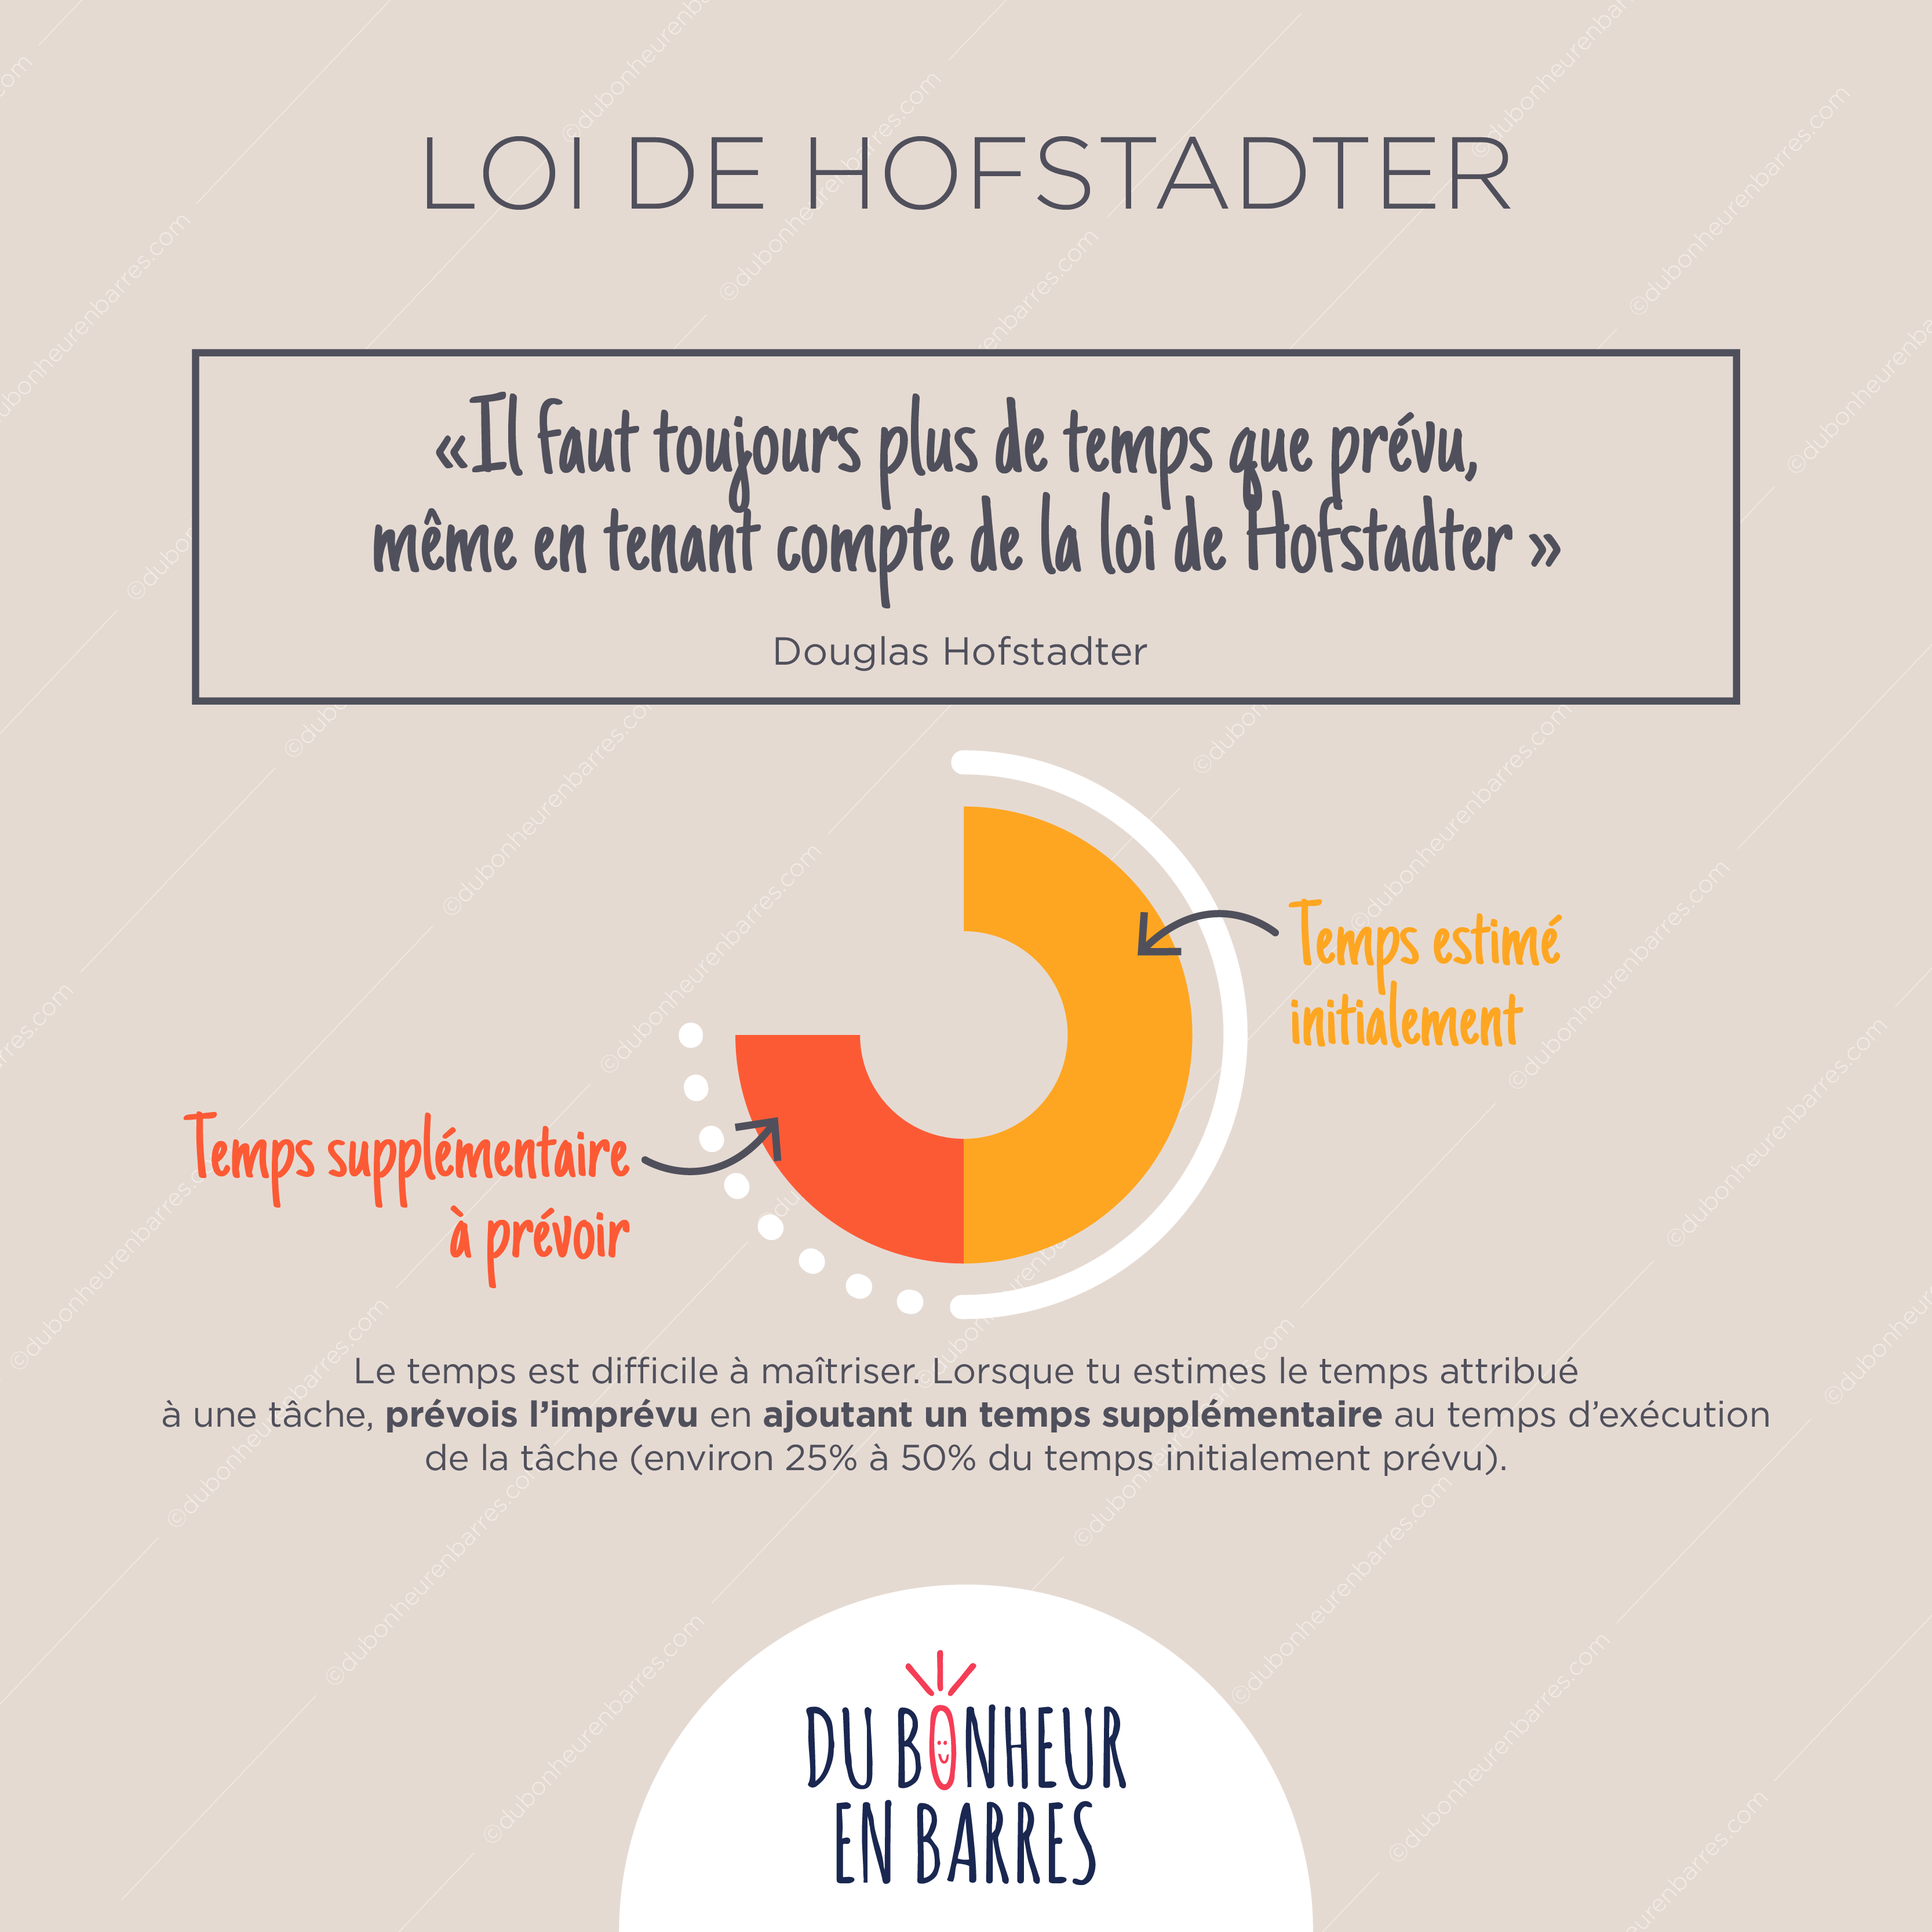 La loi de Hofstader